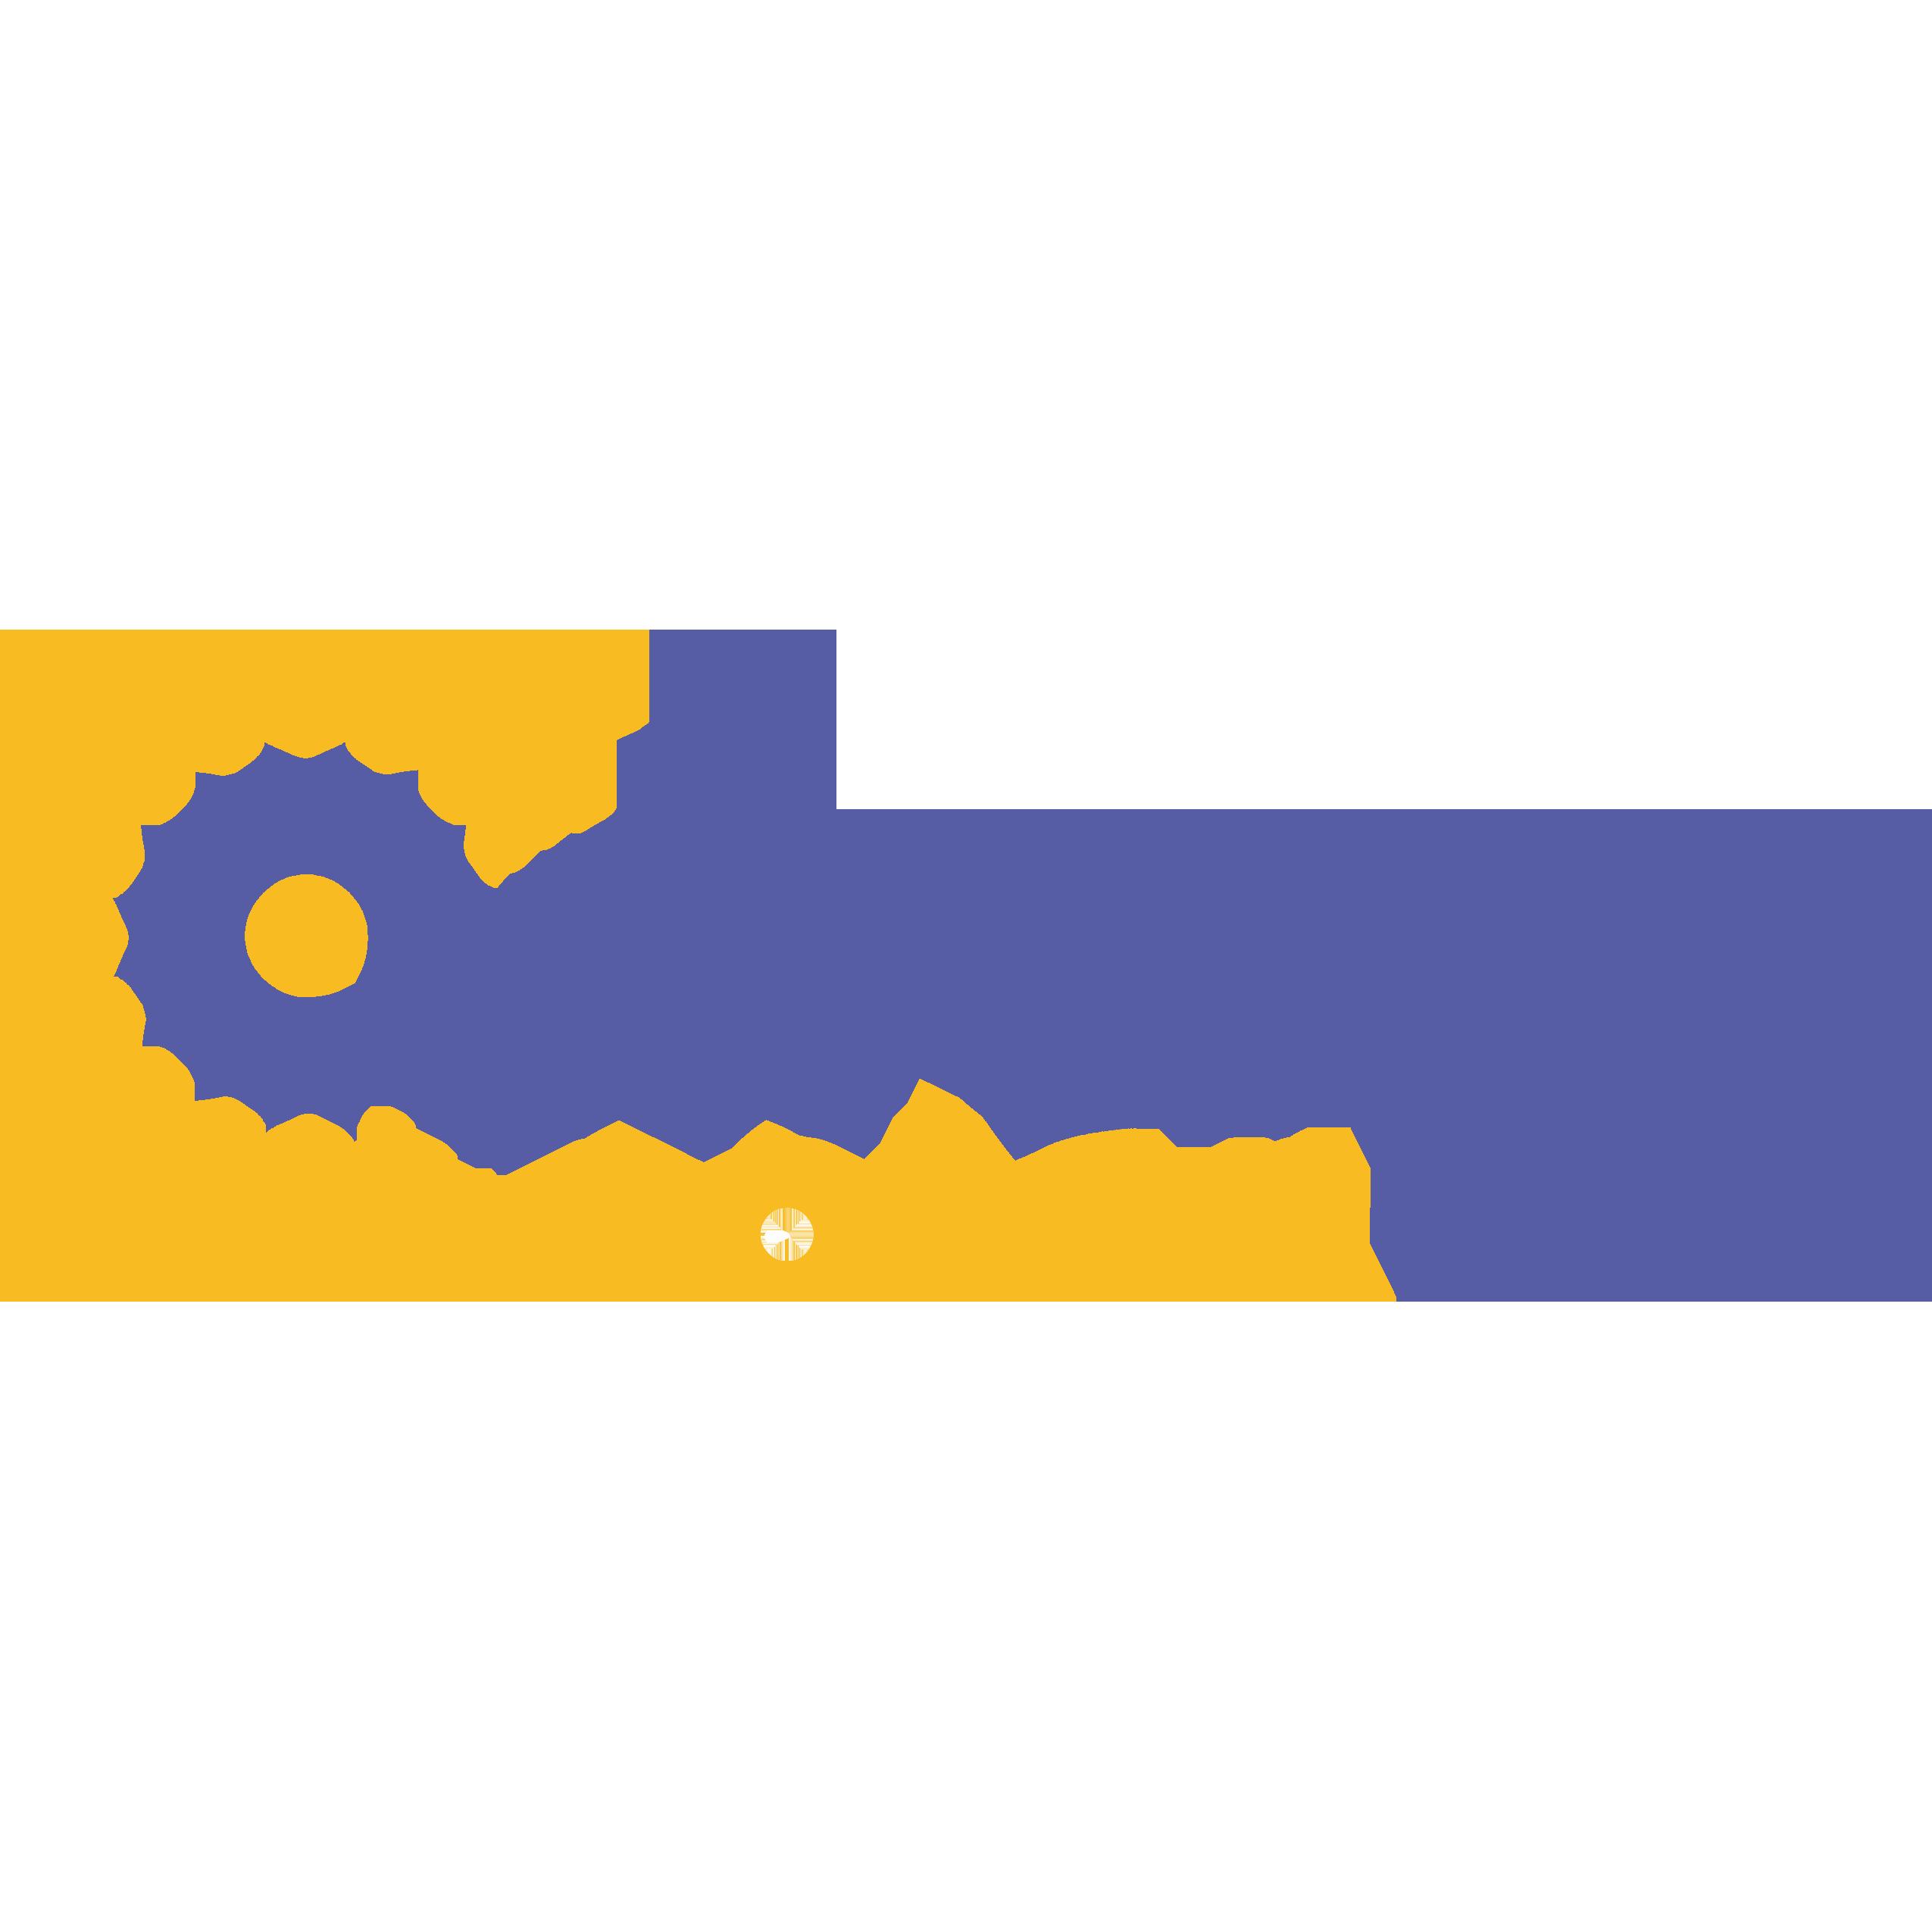 Vivint solar reviews california - Vivint Solar Reviews California 7